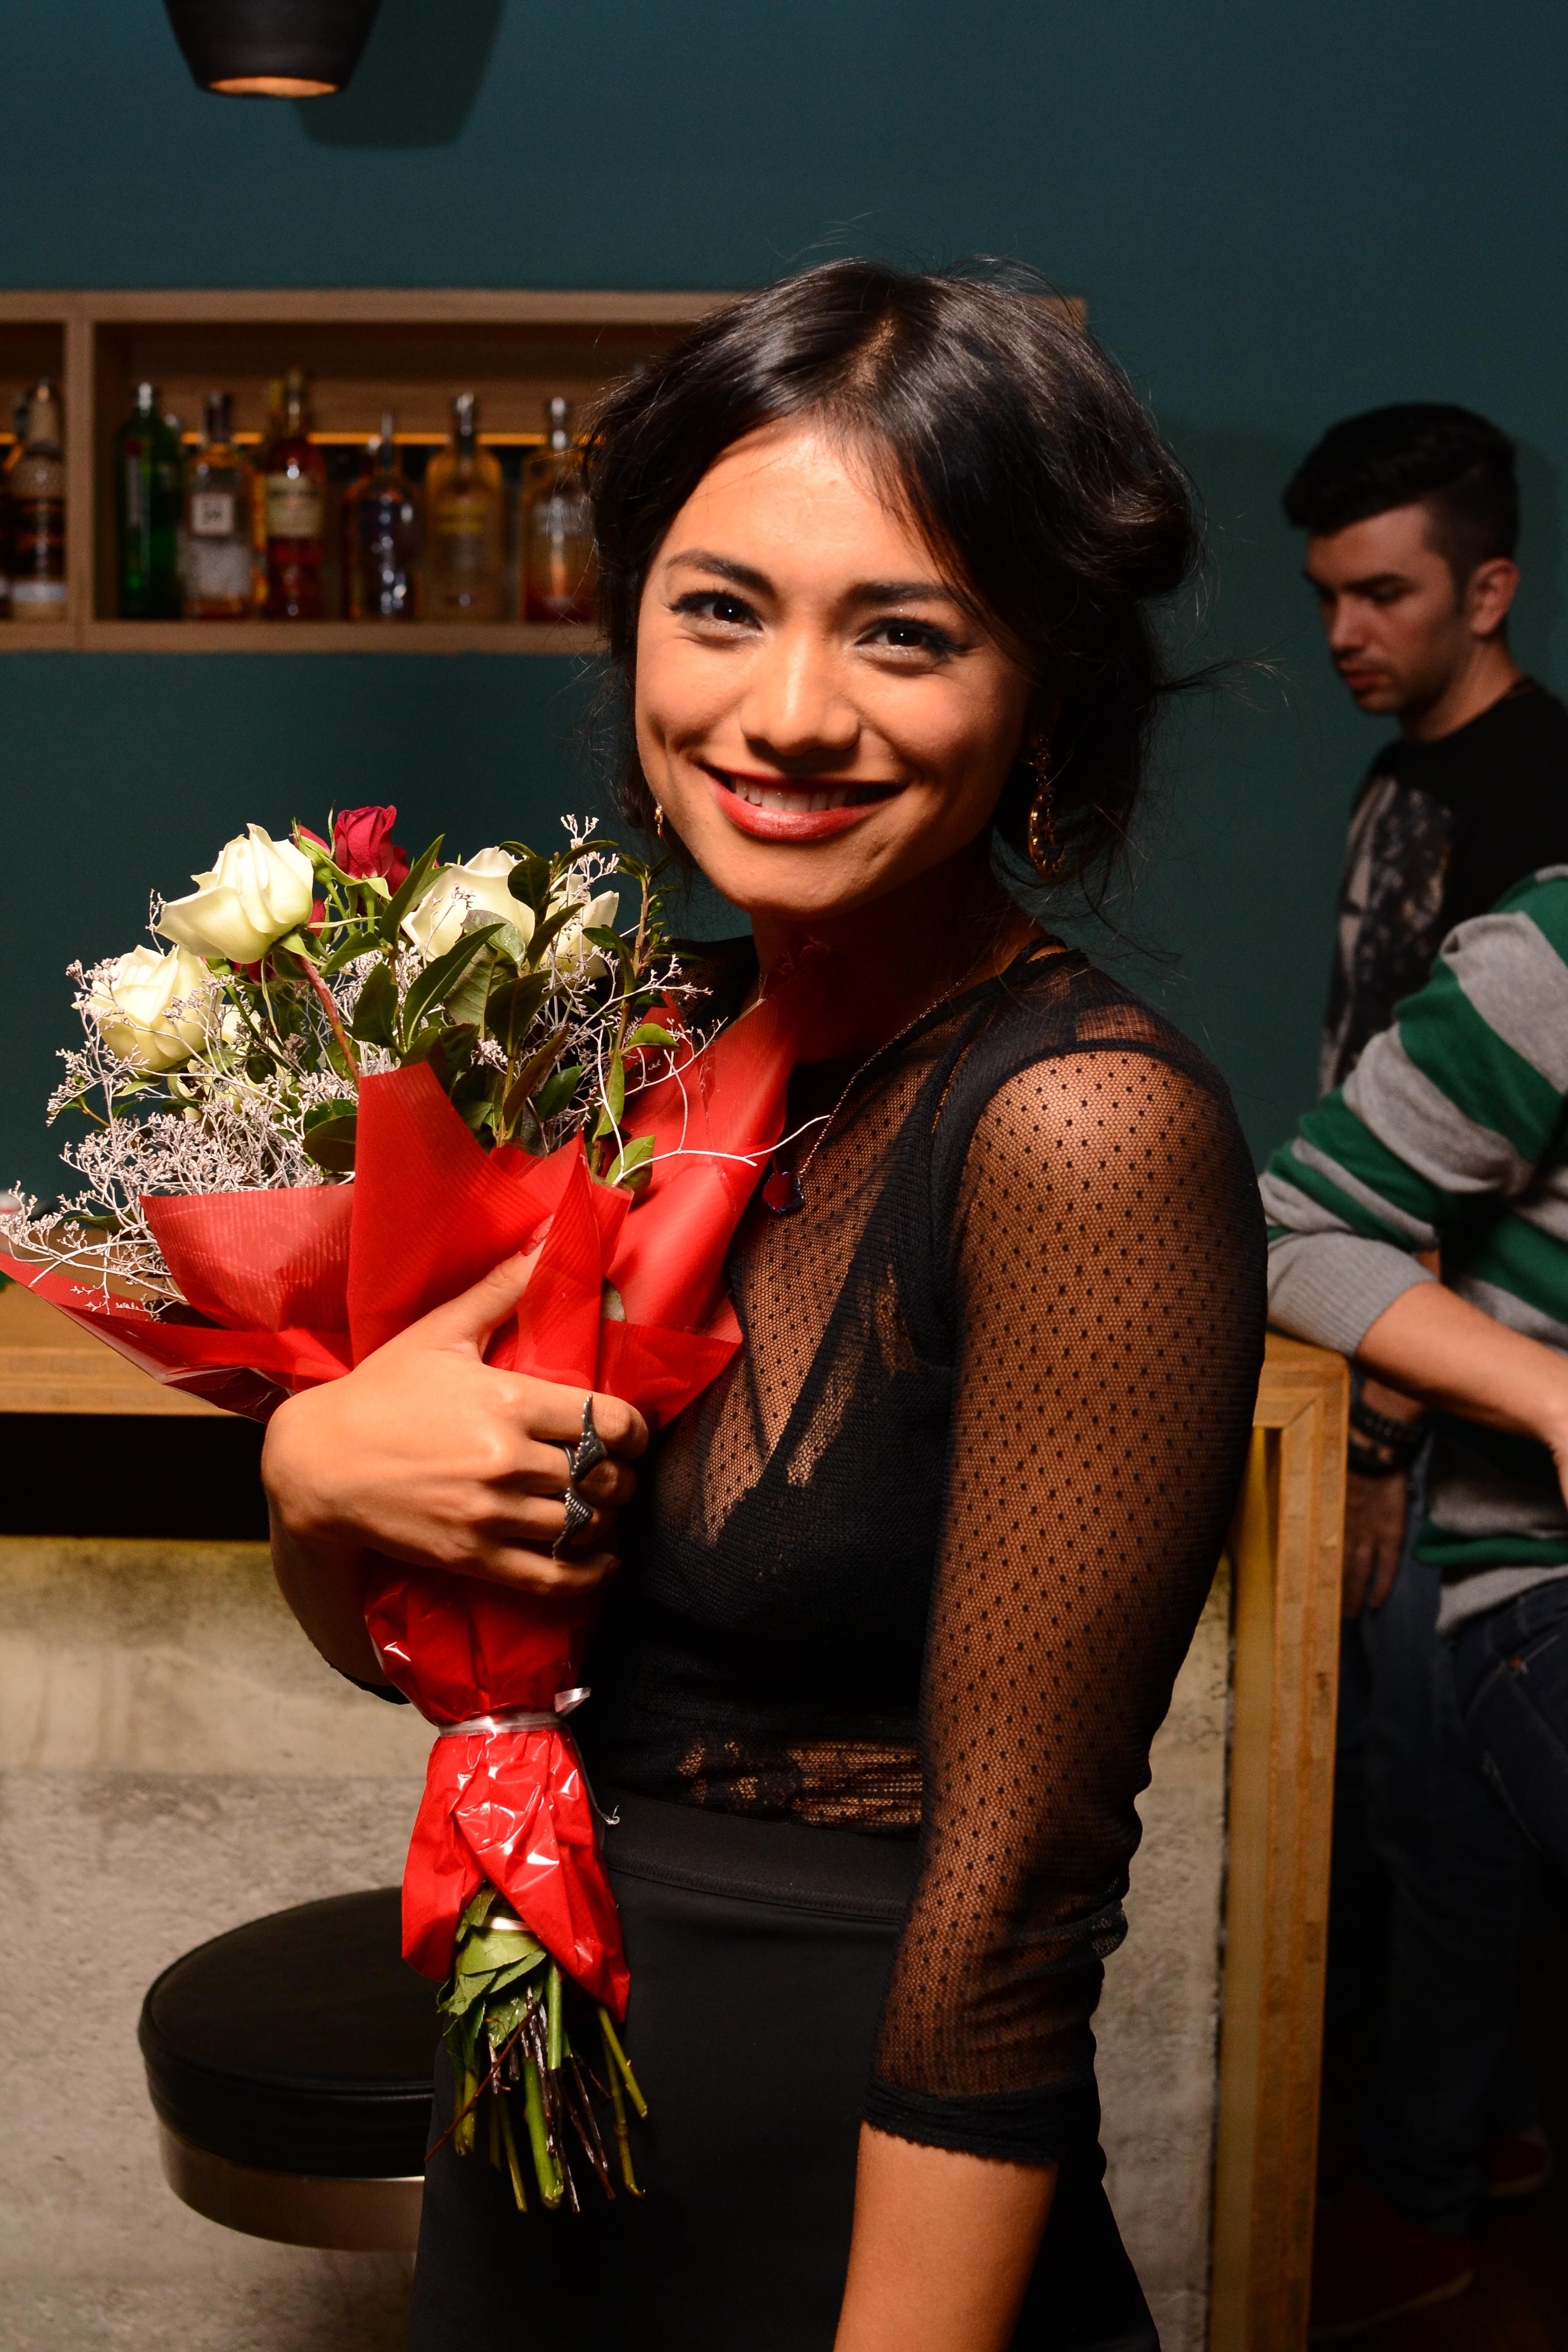 Sarbatorita a primit zeci de buchete de flori